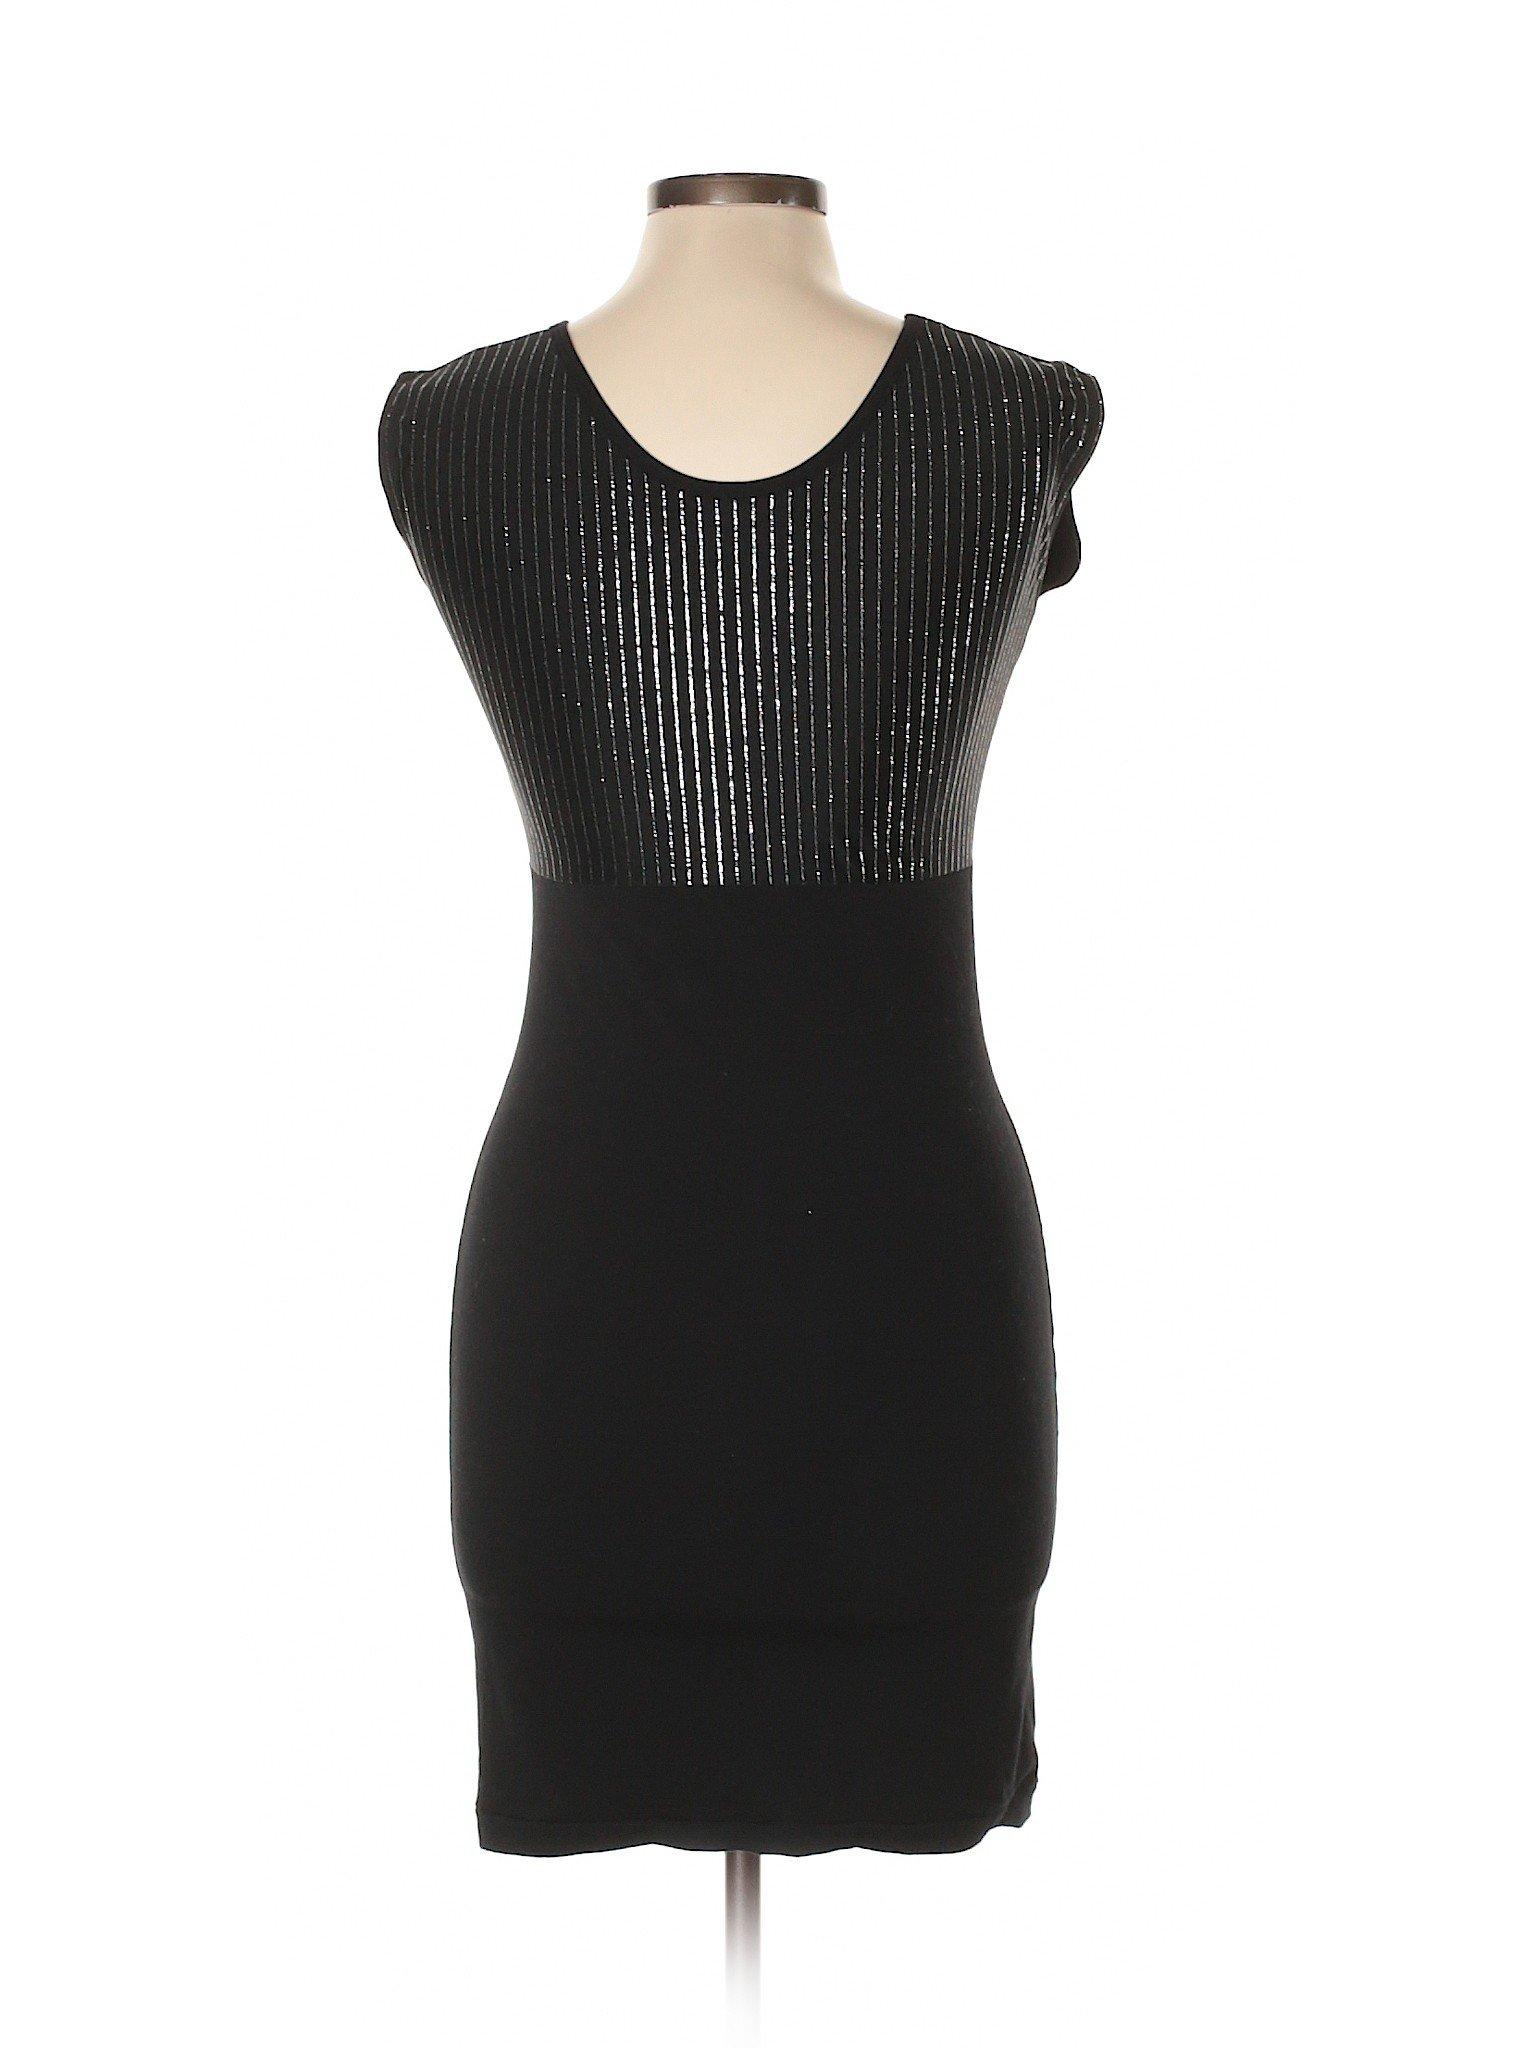 Casual Boutique Apparel American Winter Dress qPtPAr